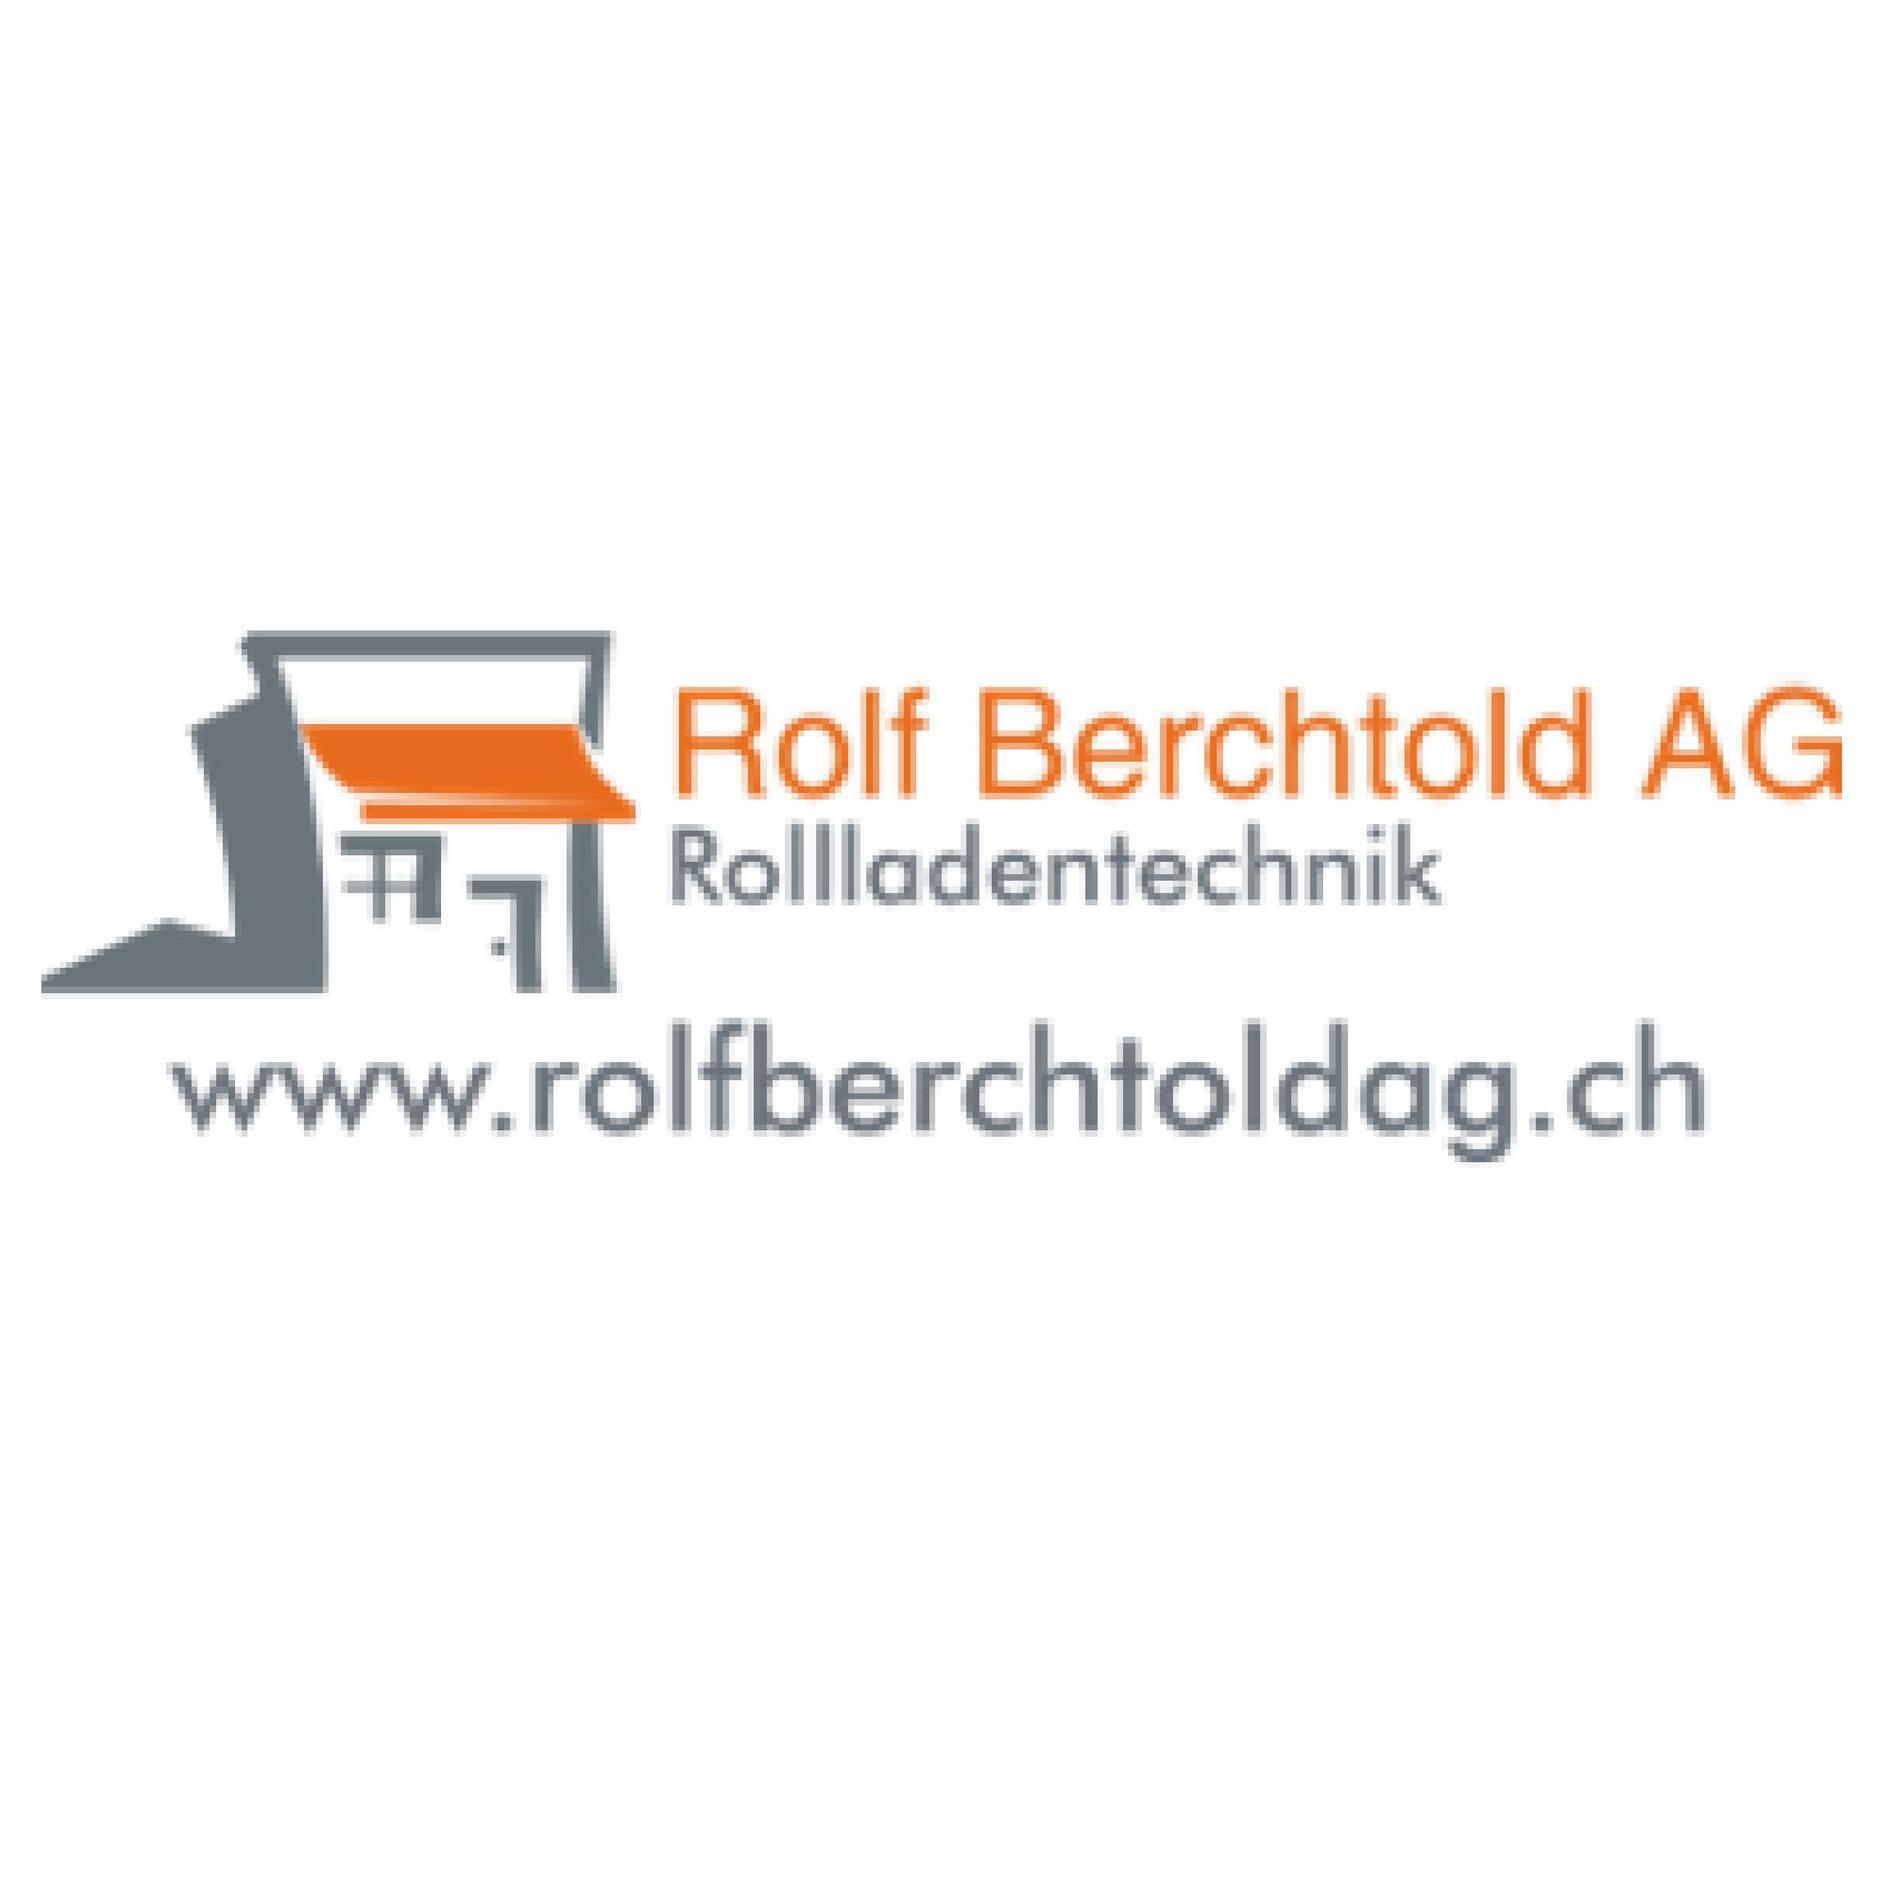 Rolf Berchtold AG